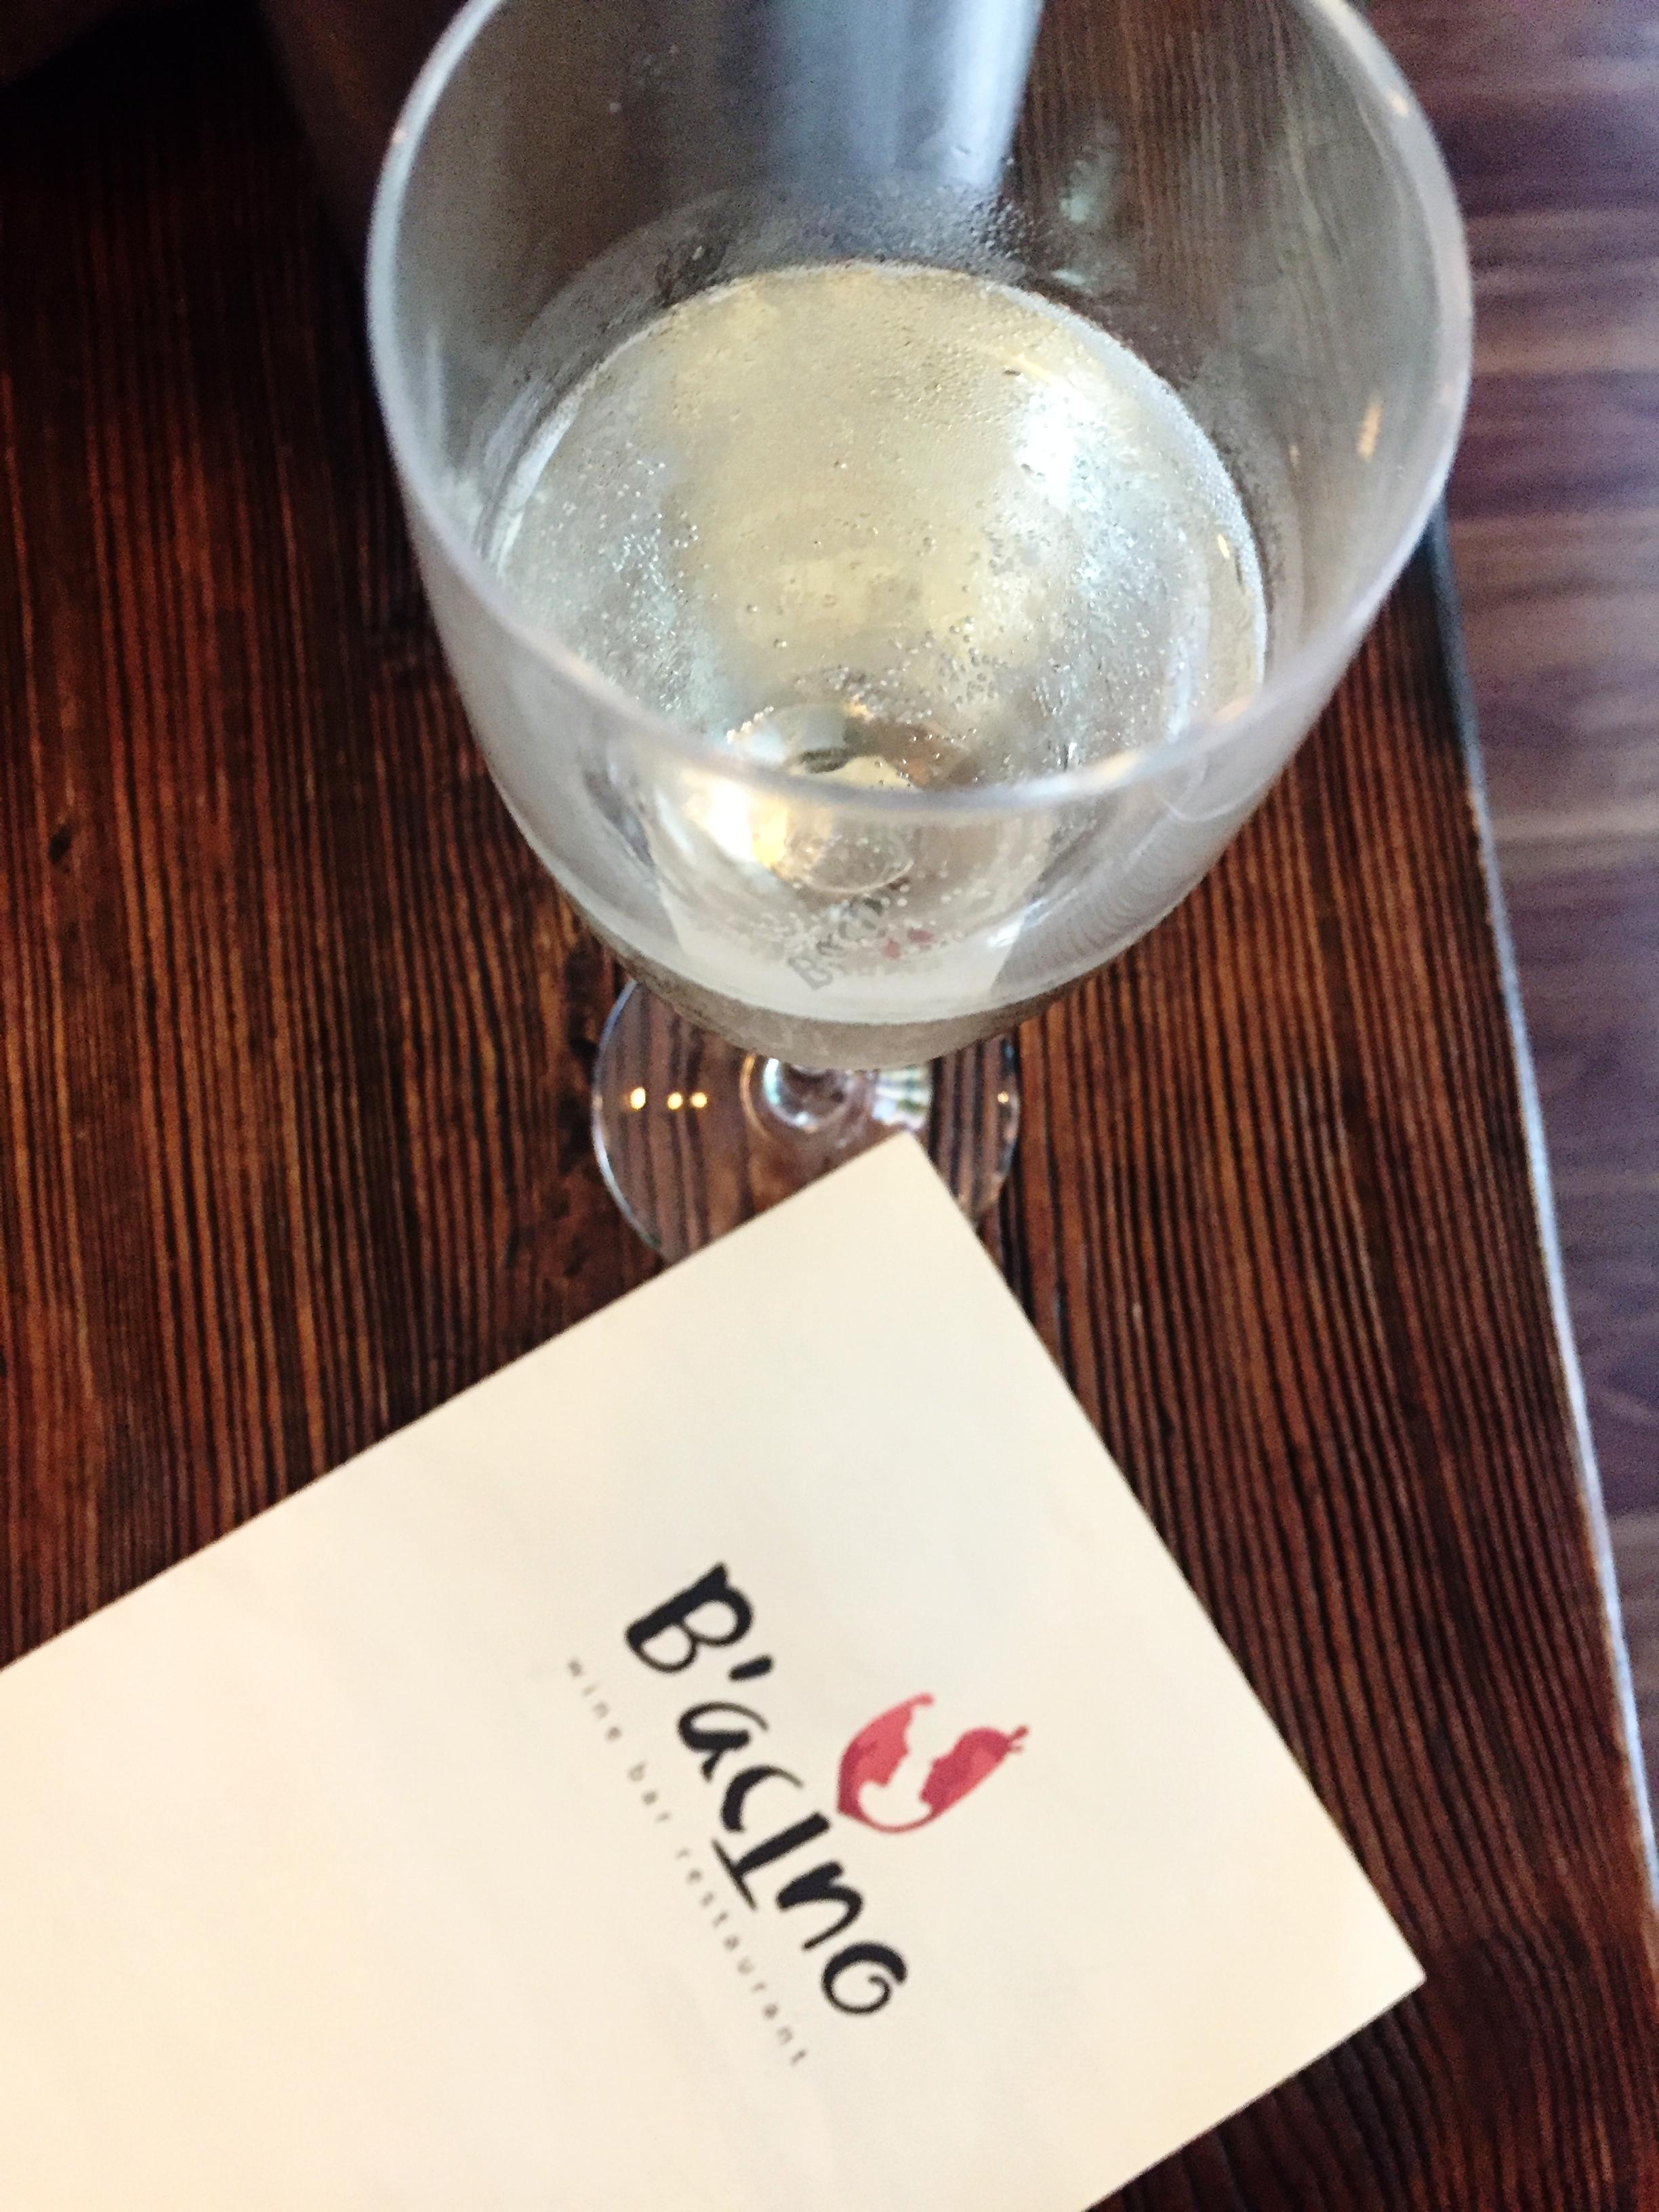 B'acino wine bar restaurant review